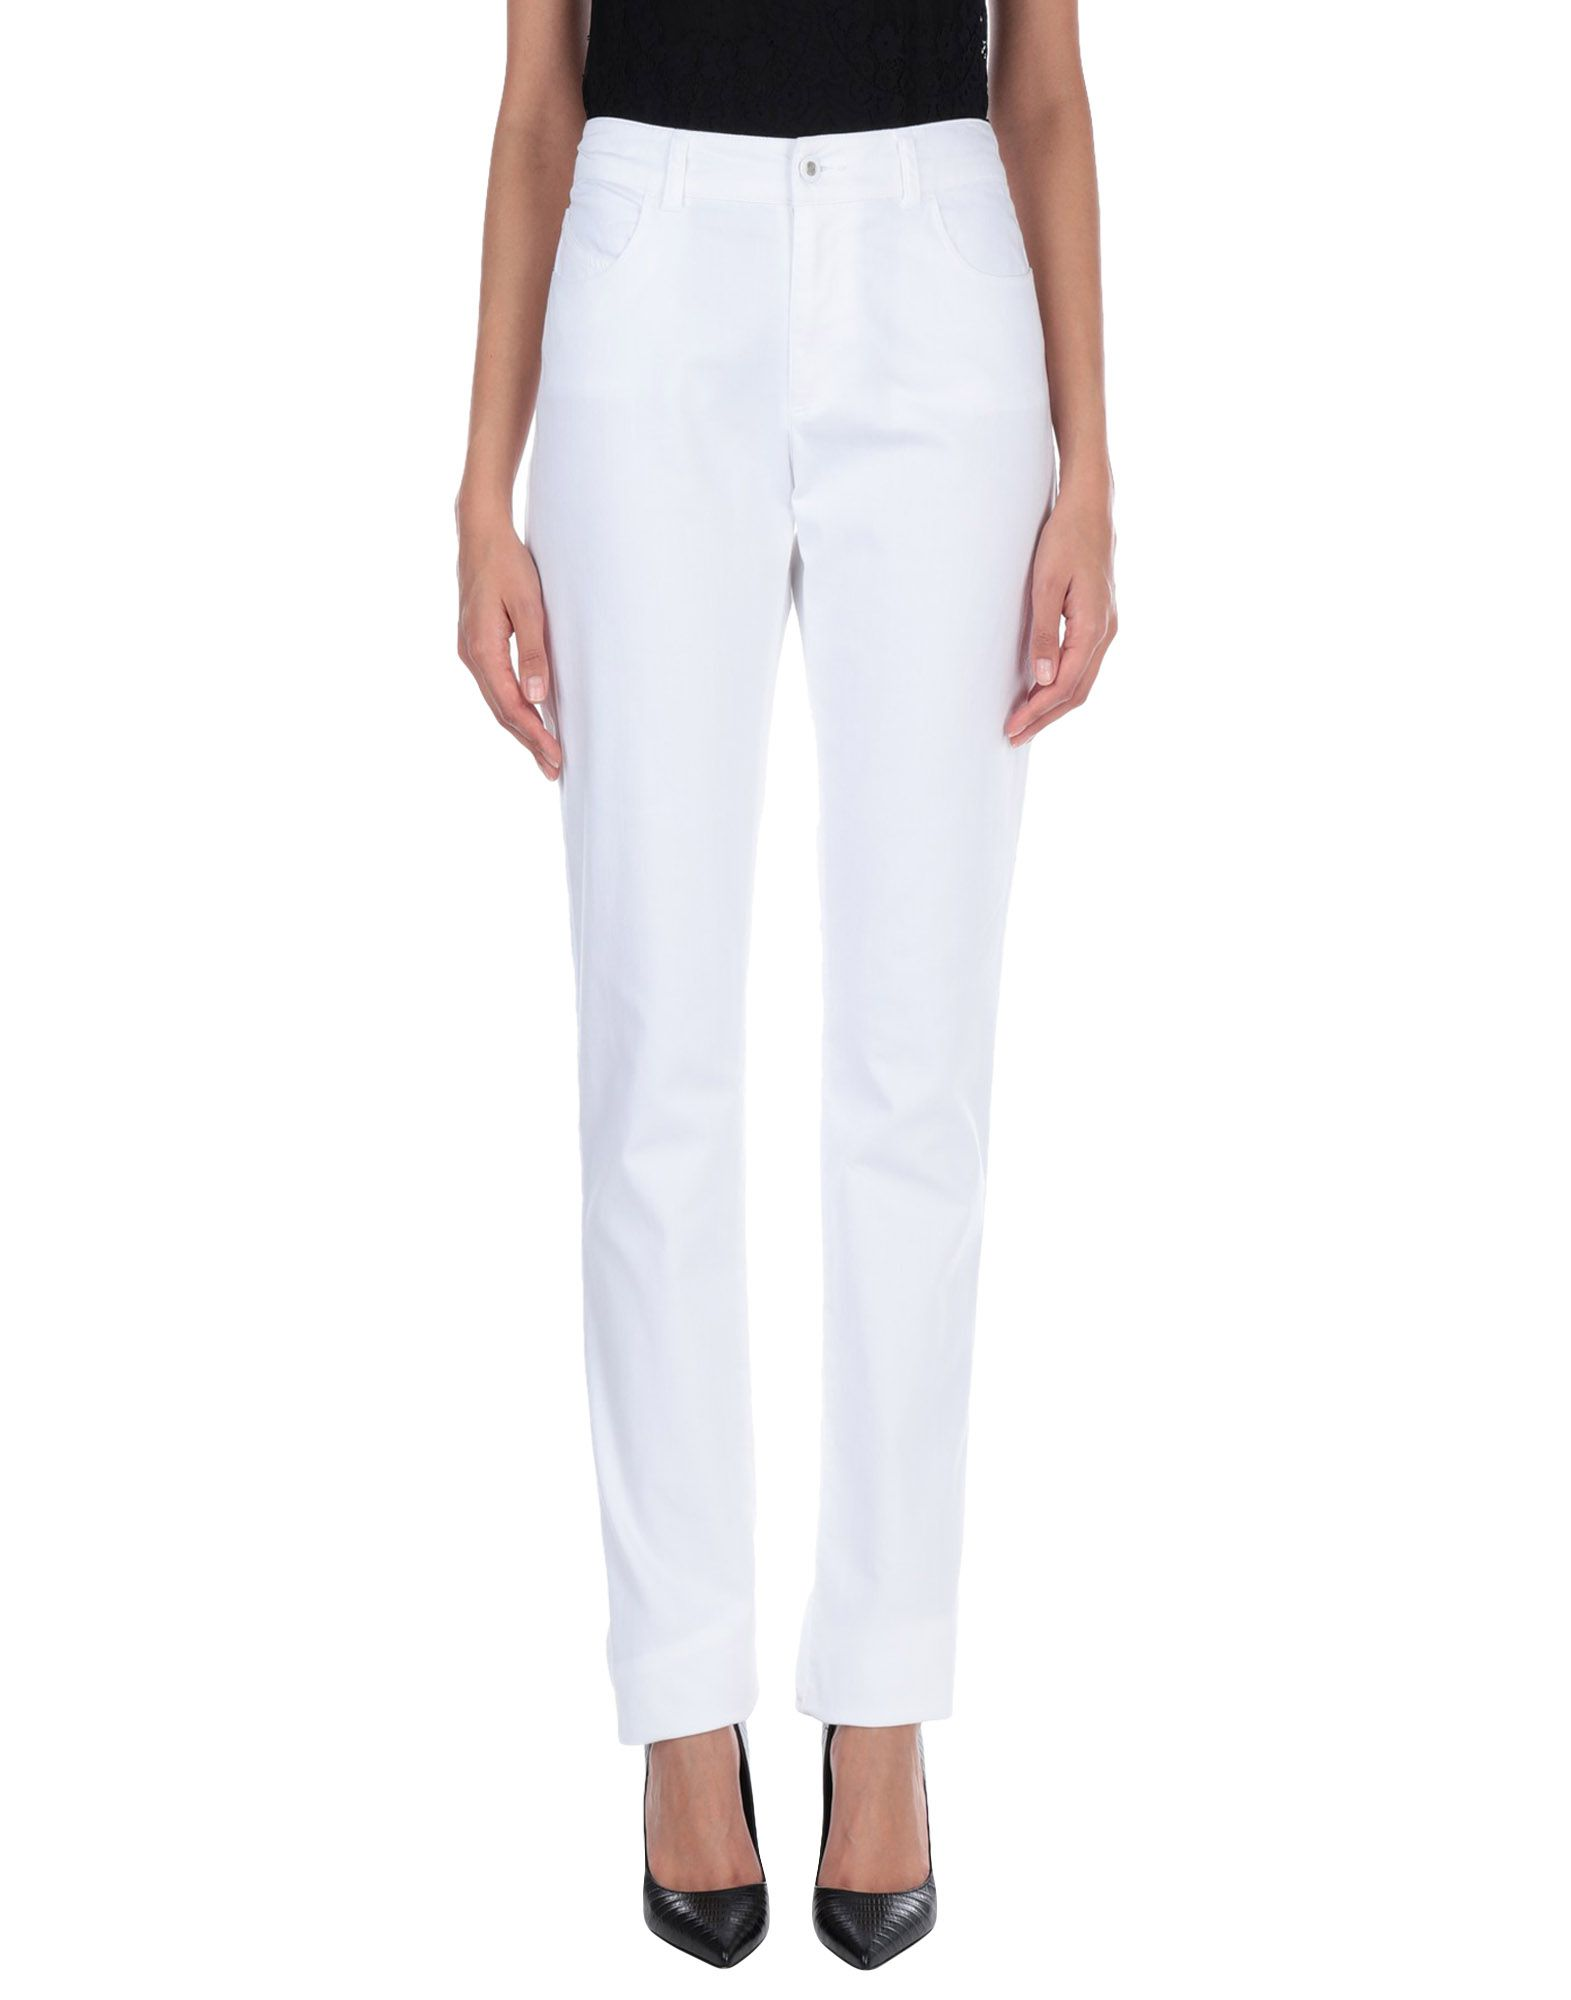 Pantaloni Pantaloni Jeans Armani Jeans donna - 42493211UD  erste Antwort